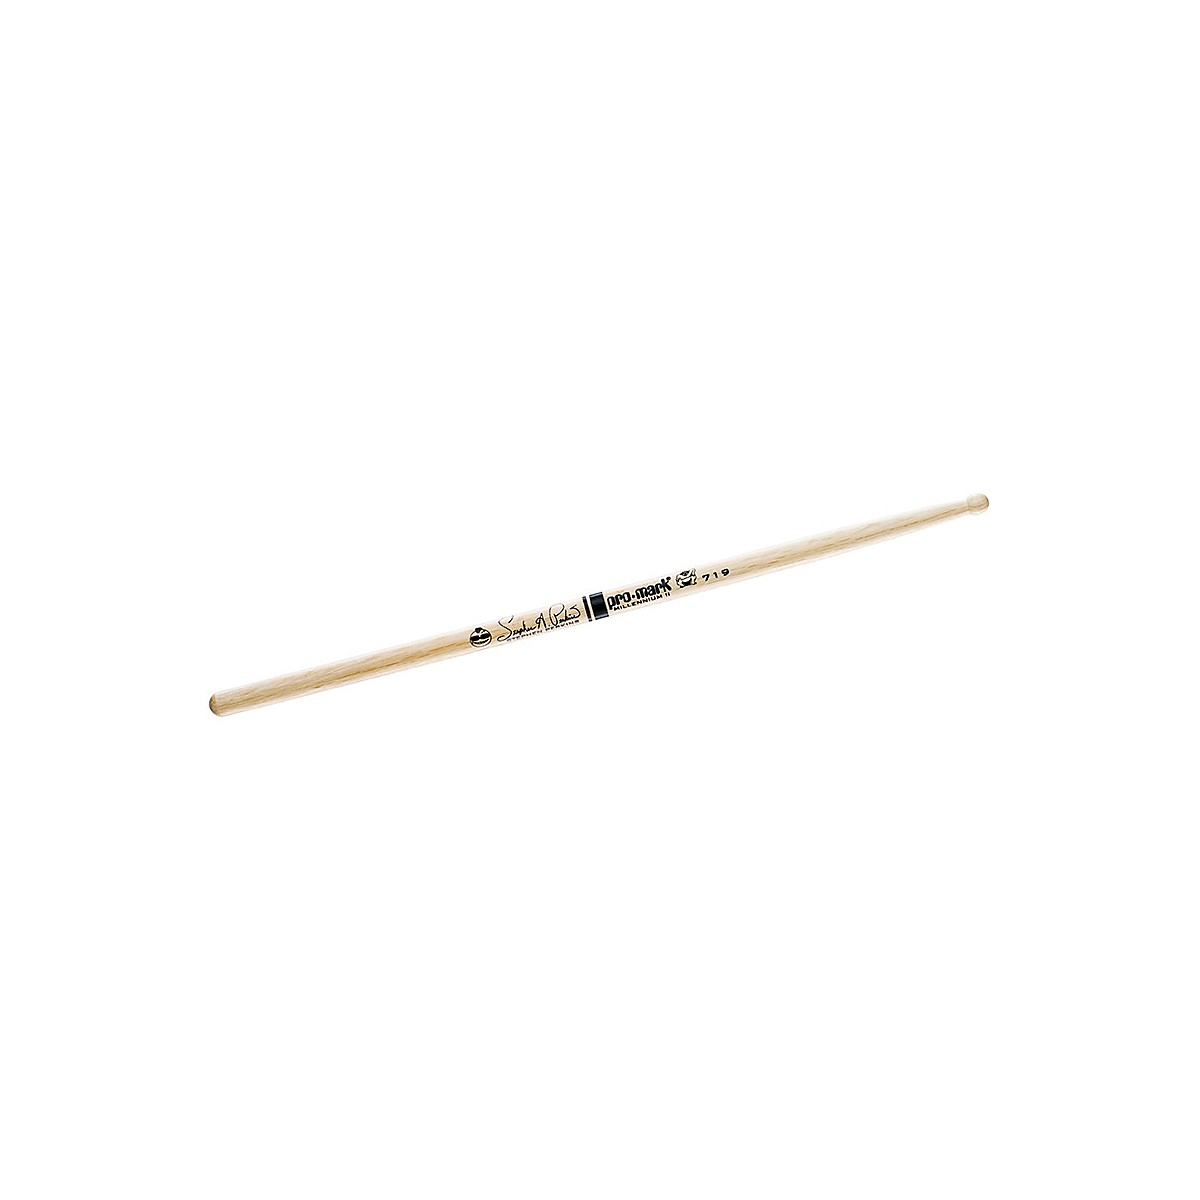 Promark 719 Stephen Perkins Signature Sticks